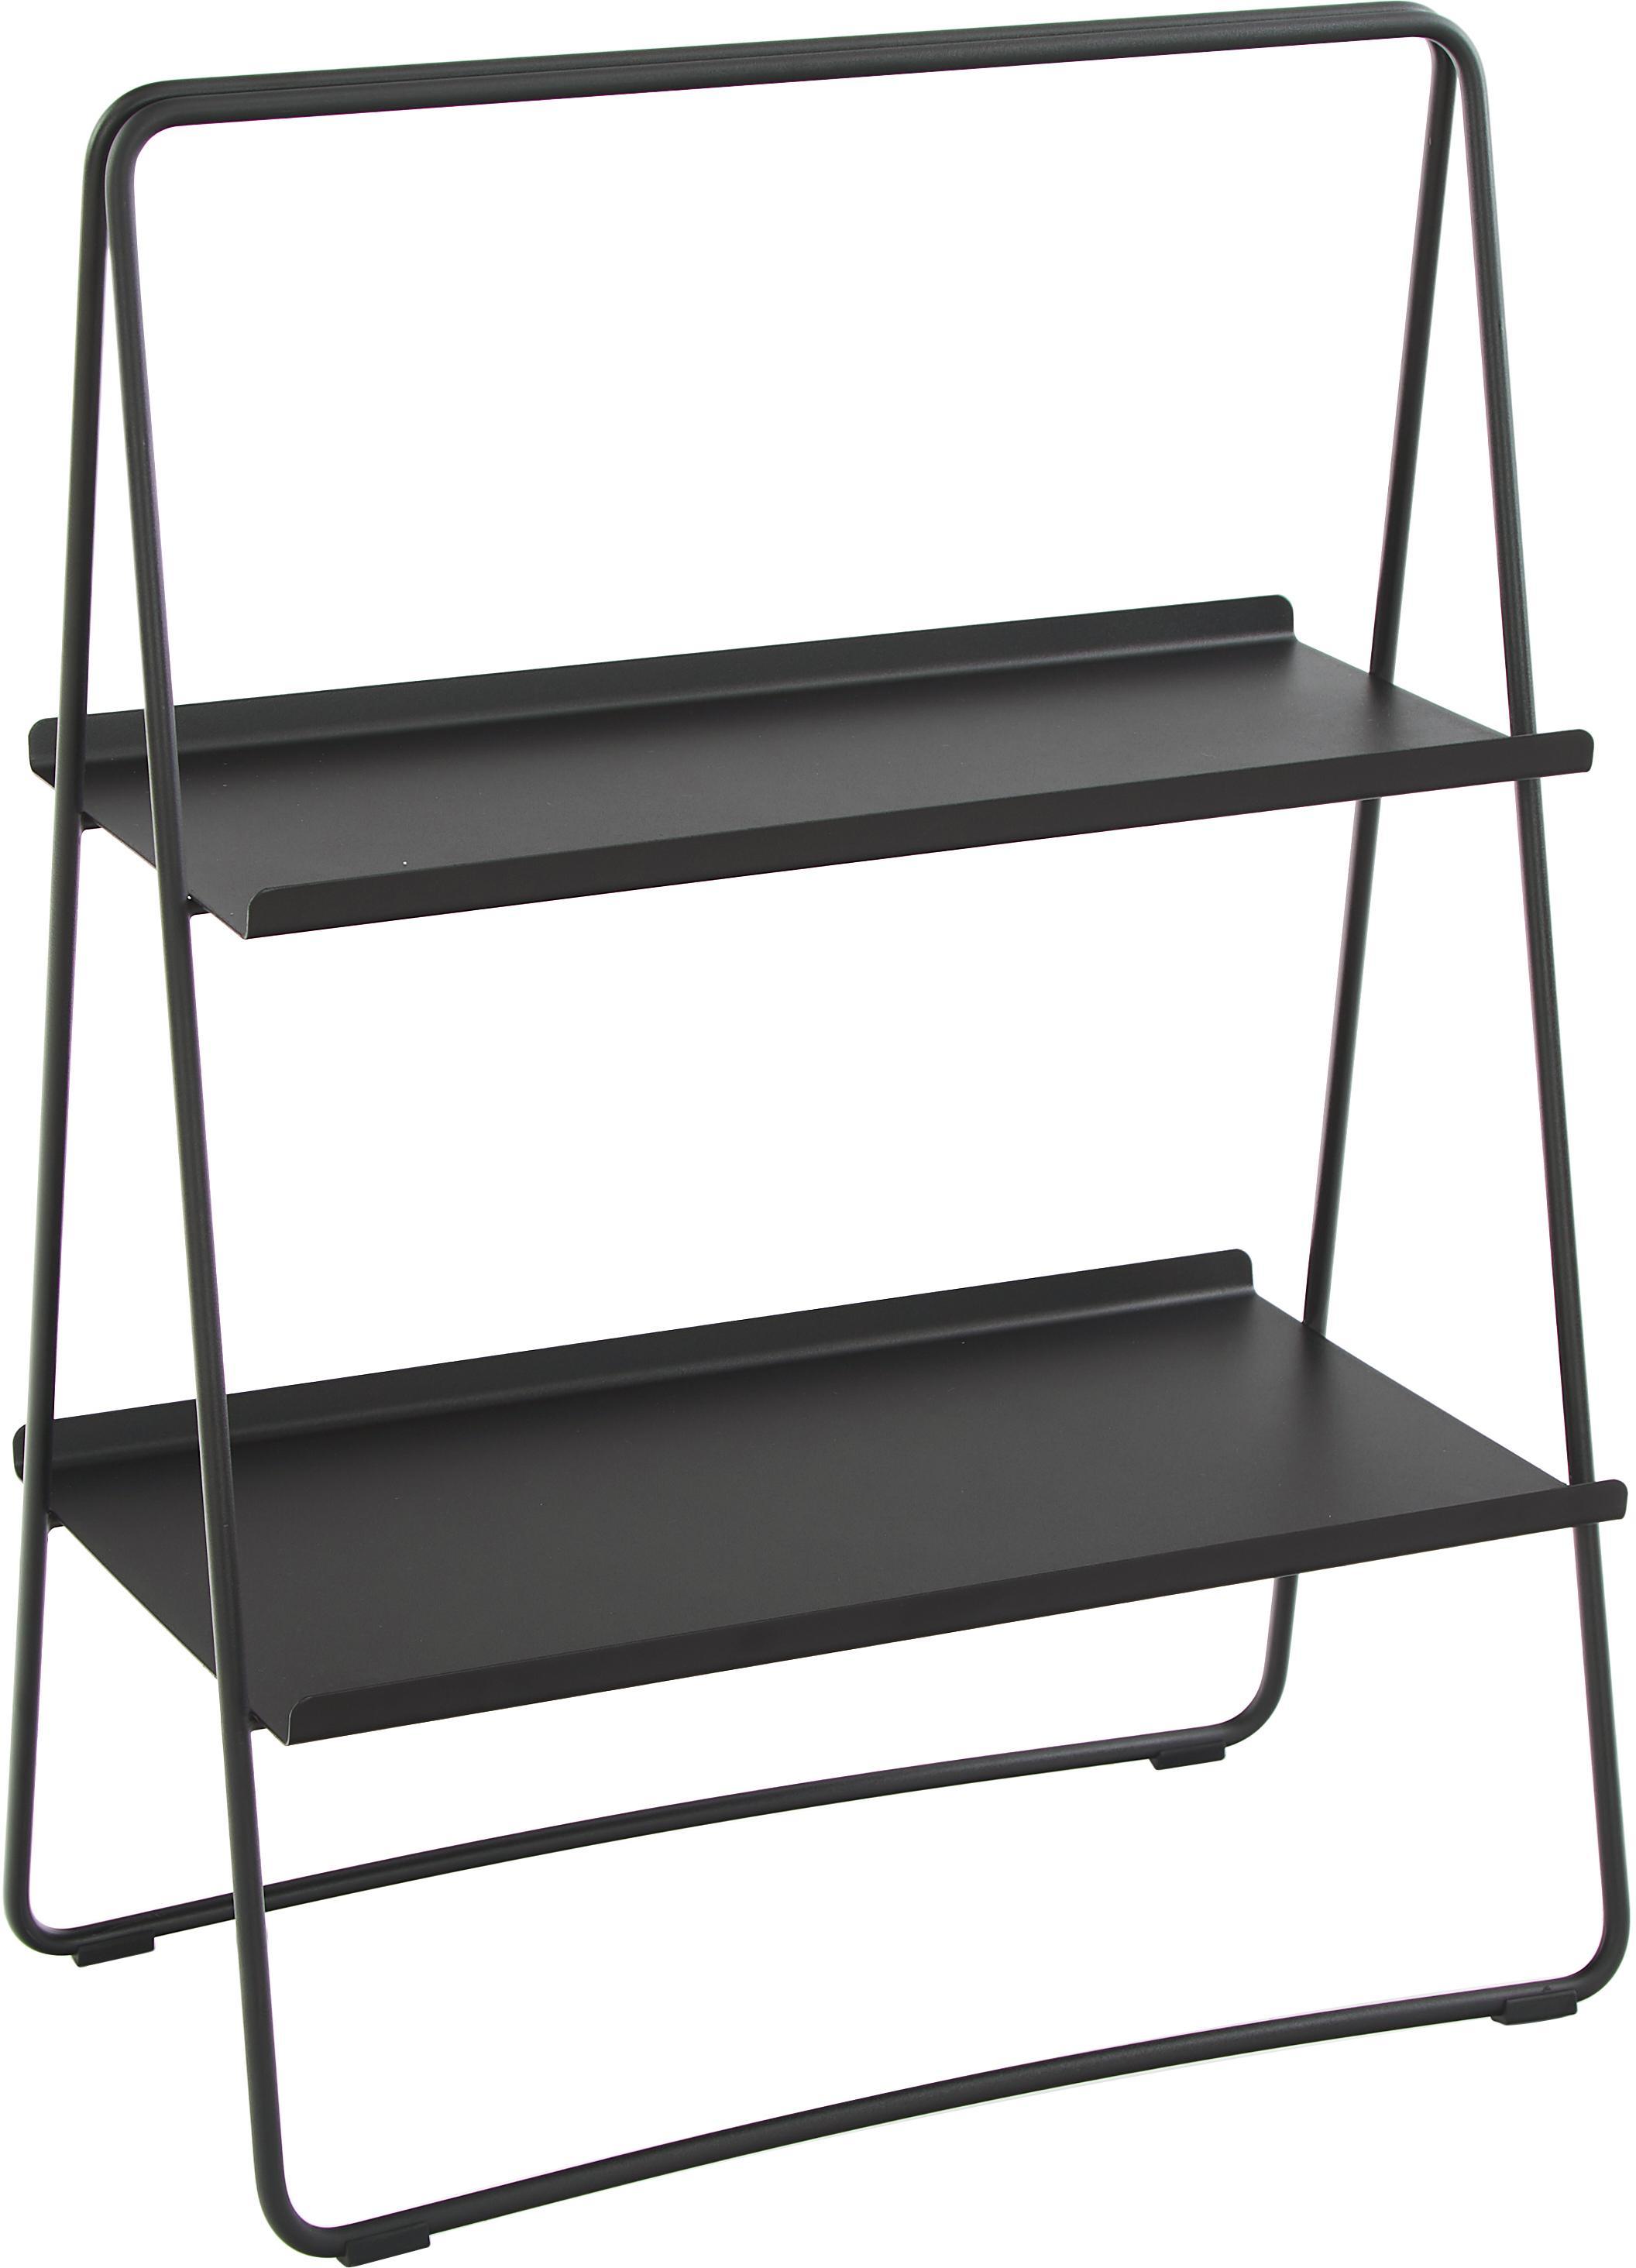 Ladder wandrek Aguina, Gelakt staal, Zwart, 53 x 75 cm